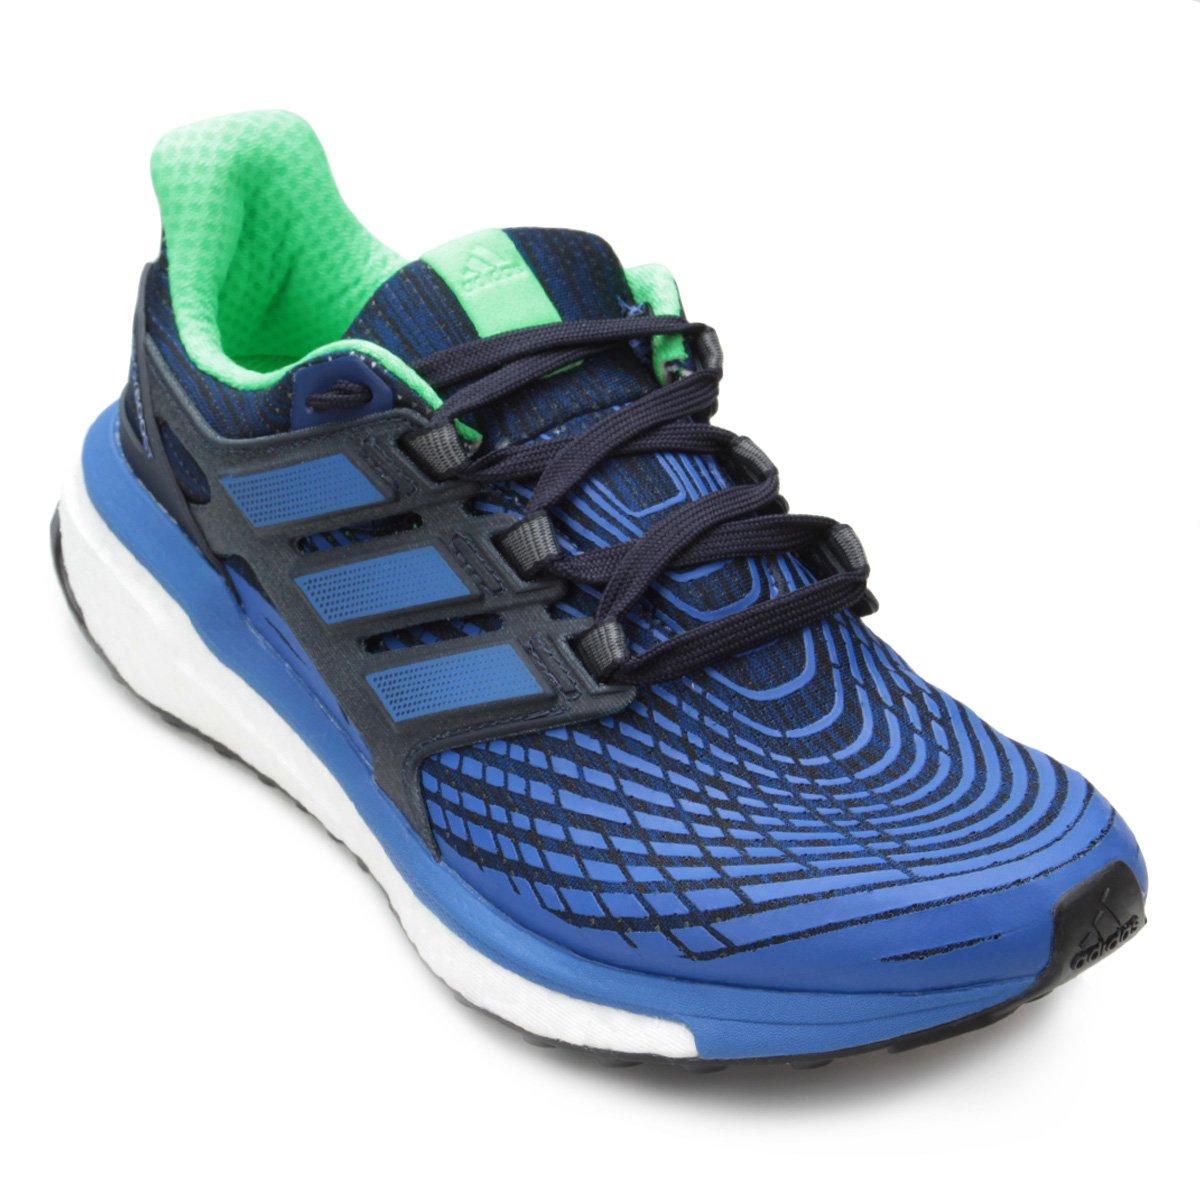 efe3c8f04c7 Tênis Adidas Energy Boost Masculino. undefined